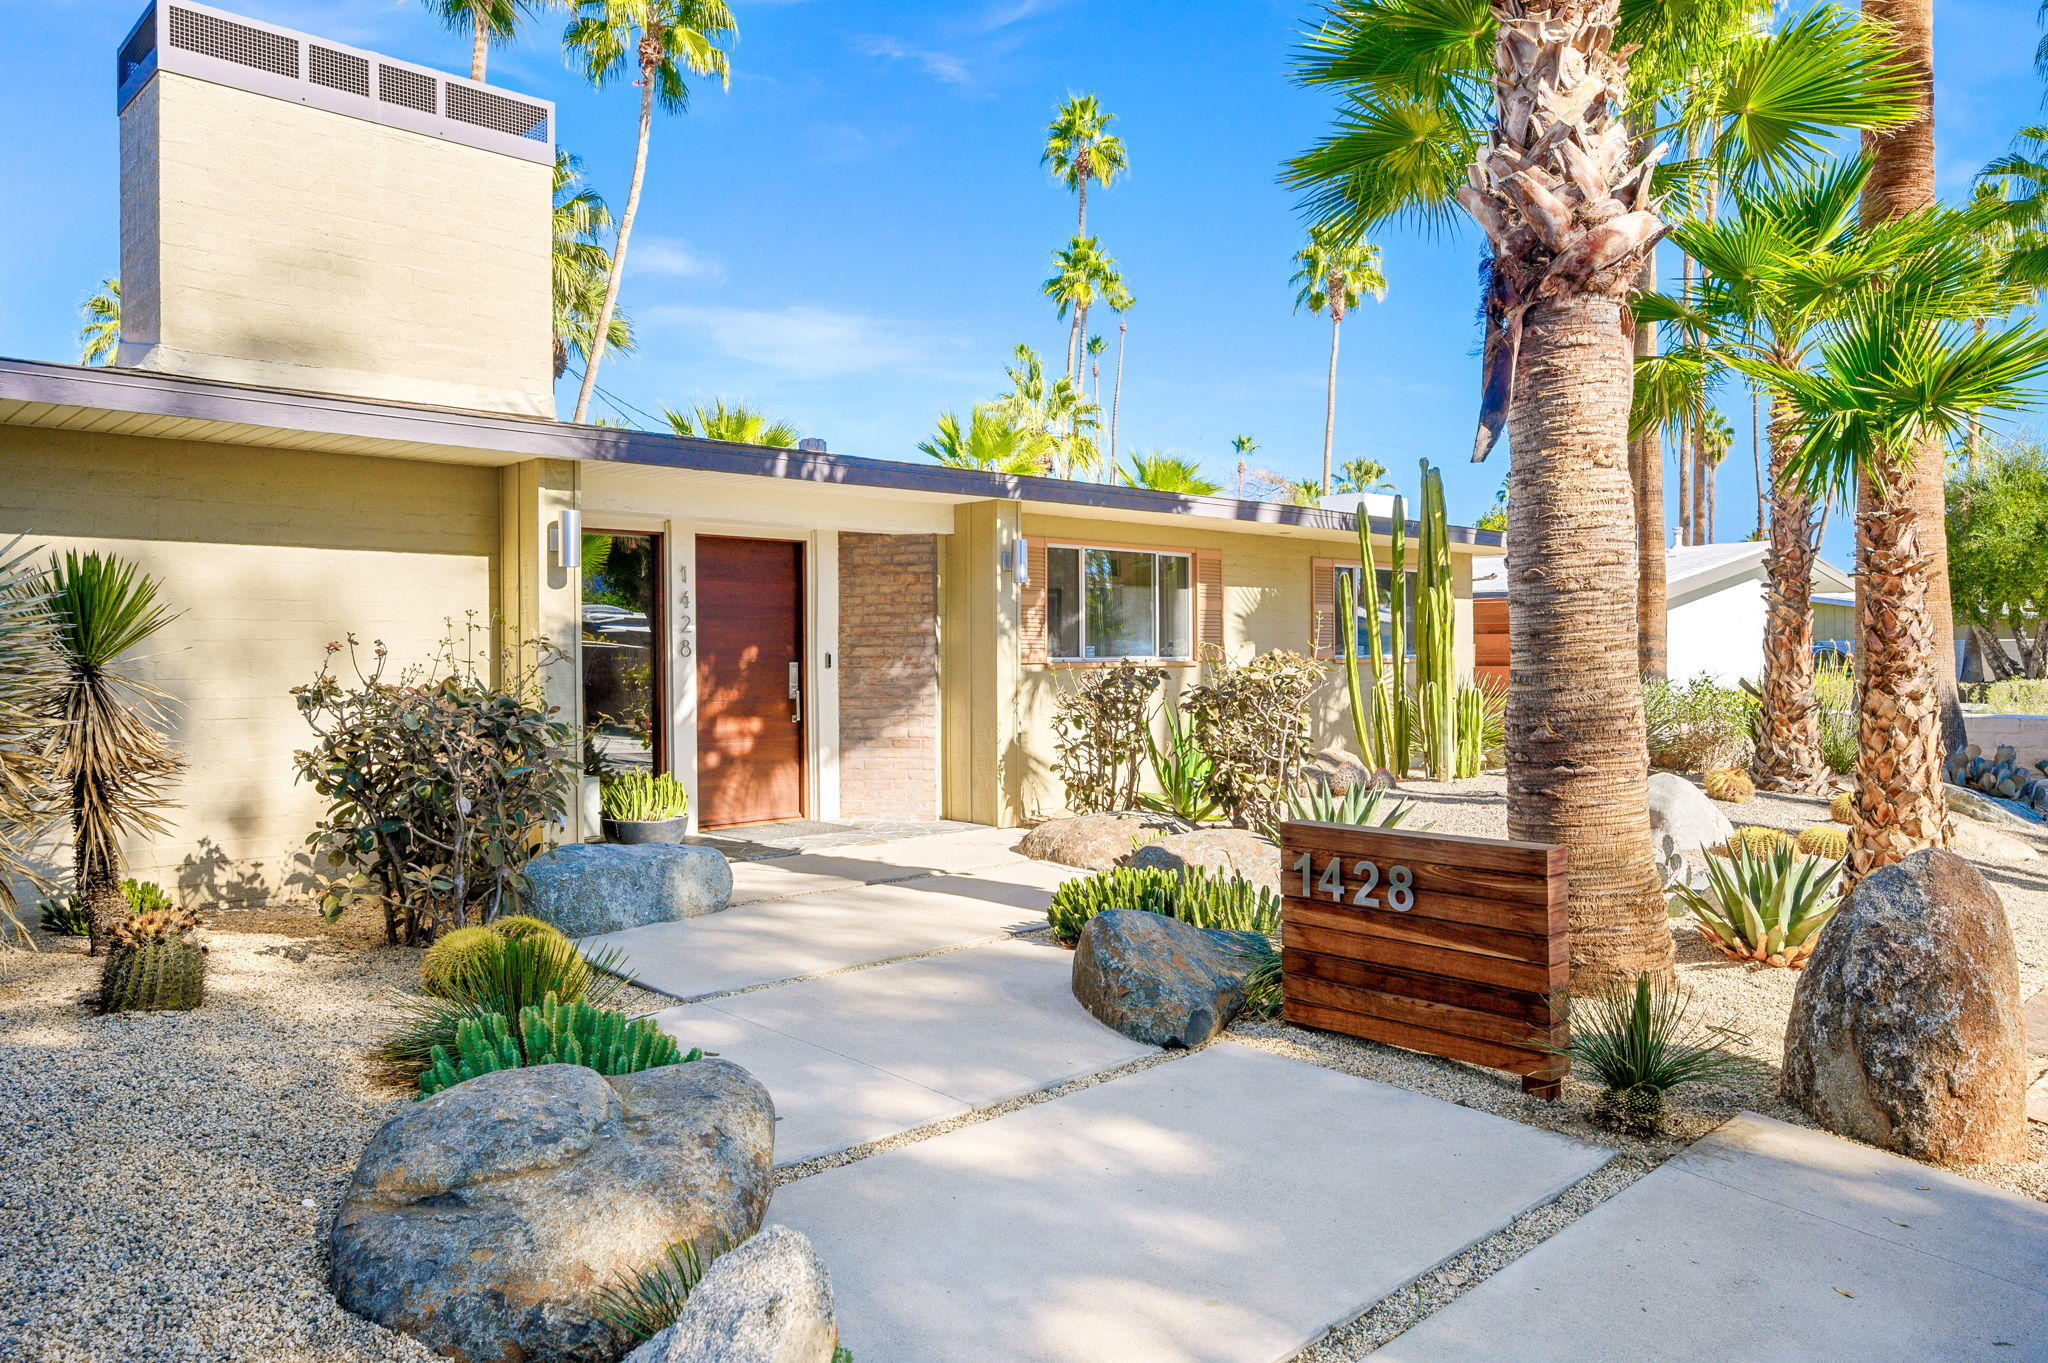 Photo of 1428 E San Lorenzo Road, Palm Springs, CA 92264